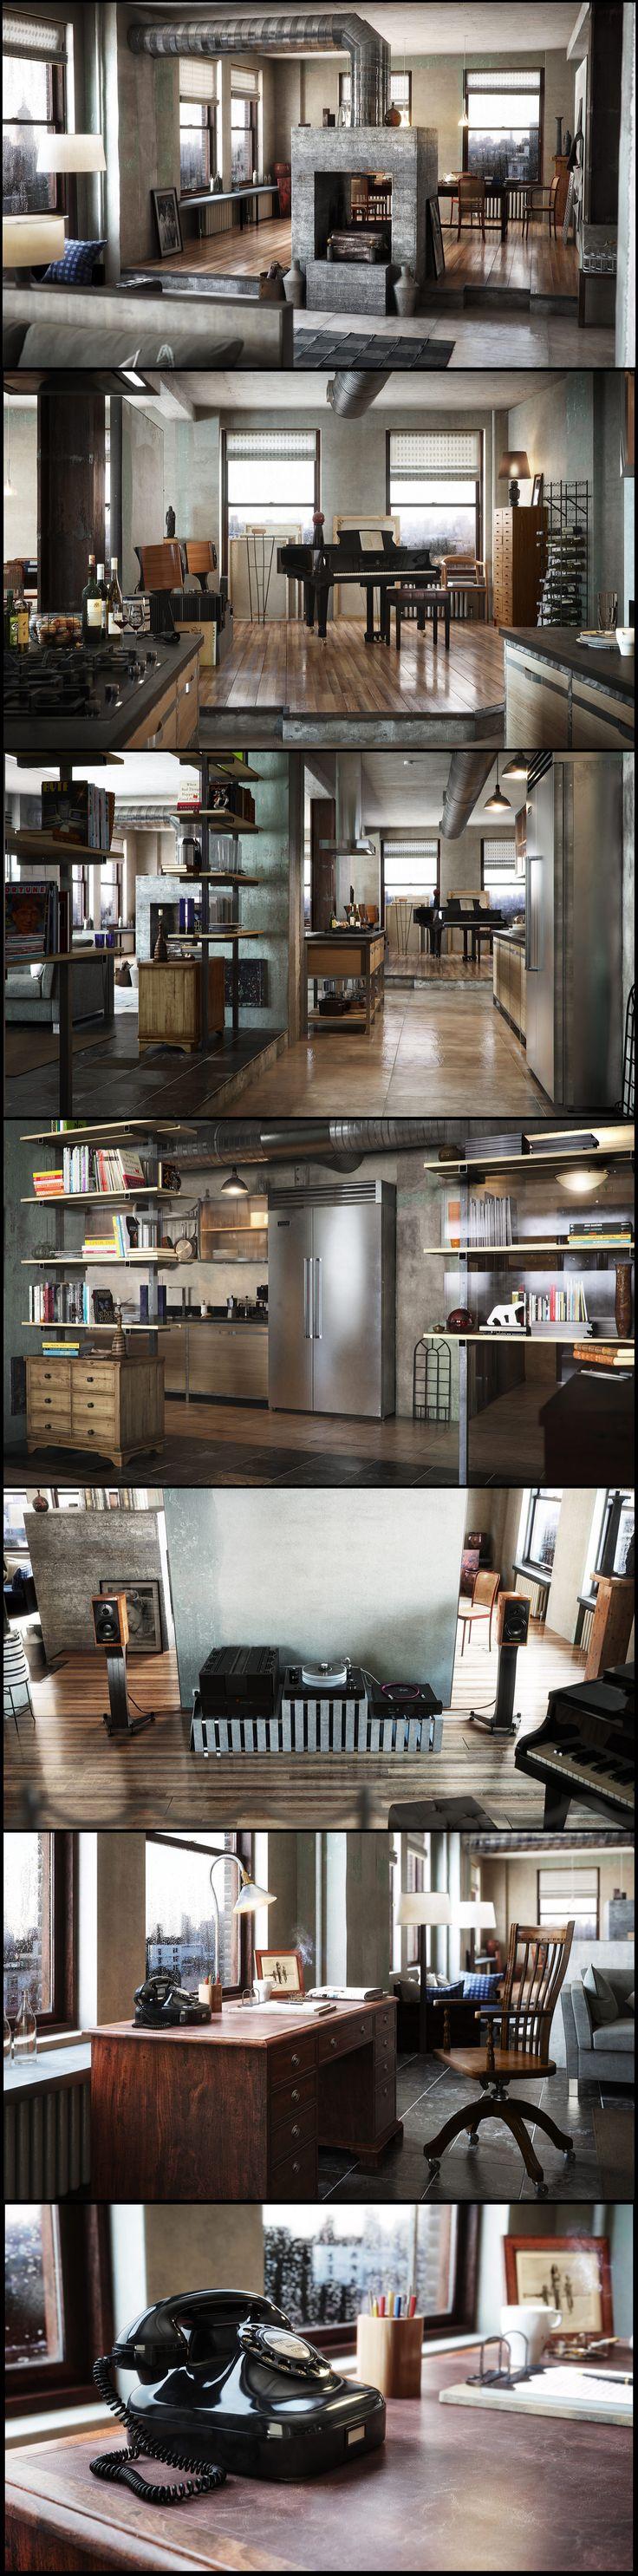 best 25 new york apartments ideas on pinterest new york. Black Bedroom Furniture Sets. Home Design Ideas